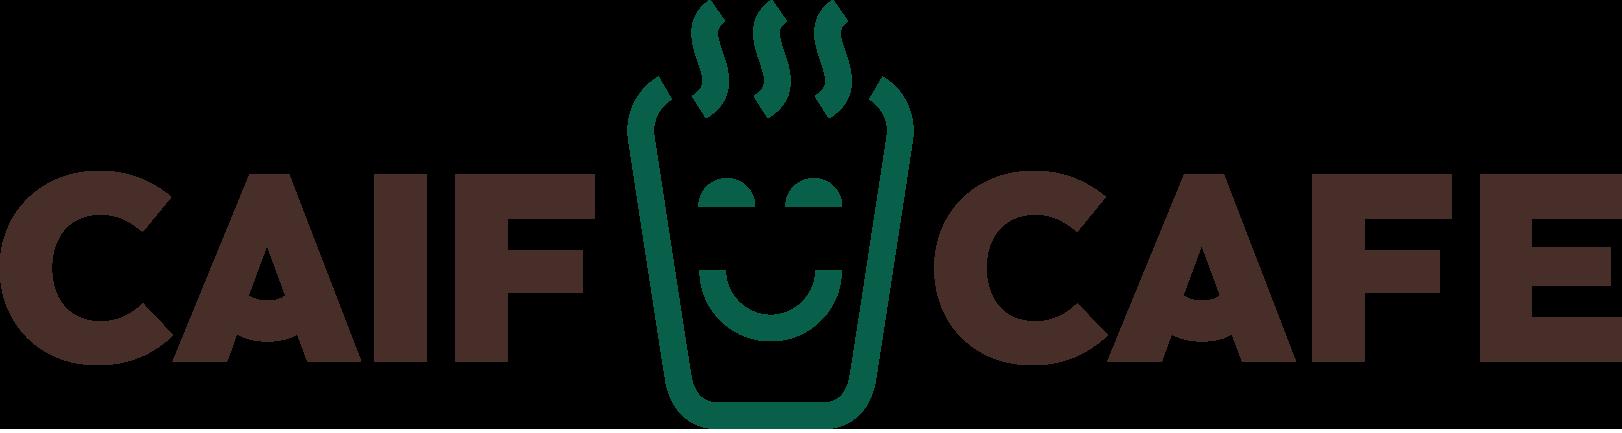 caif cafe